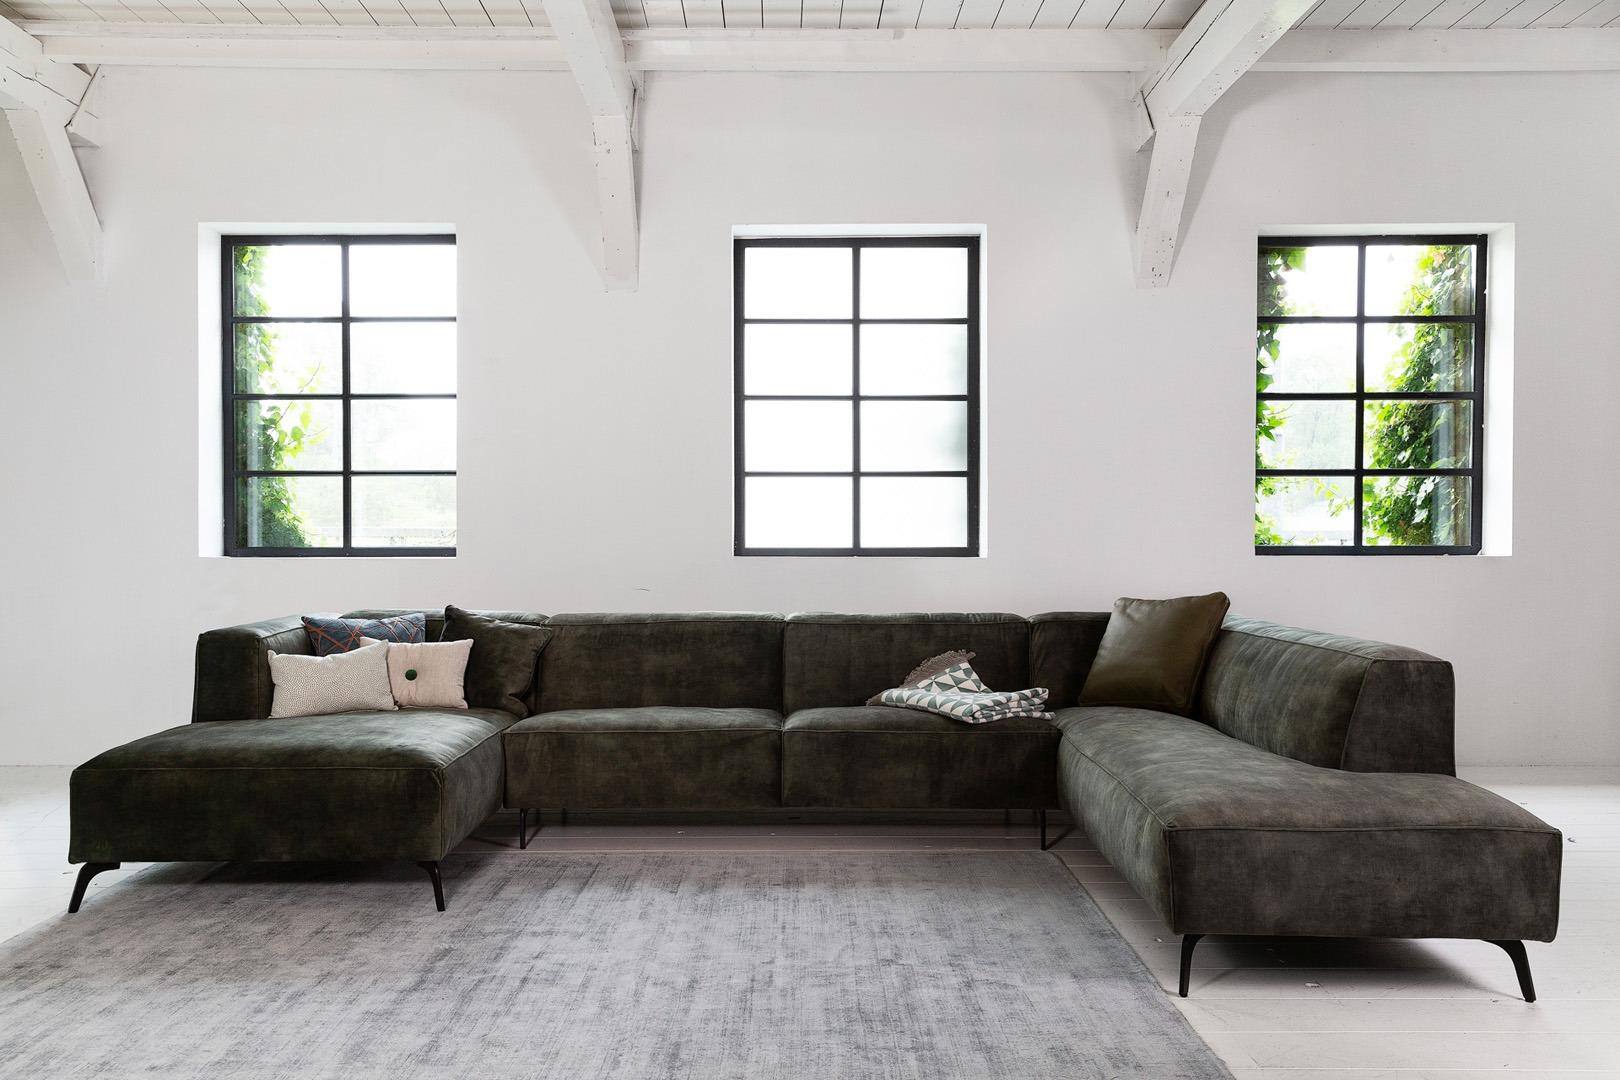 vino-piemonte-groen-stof-hoekbank-ubank-soofs-interieur (1)